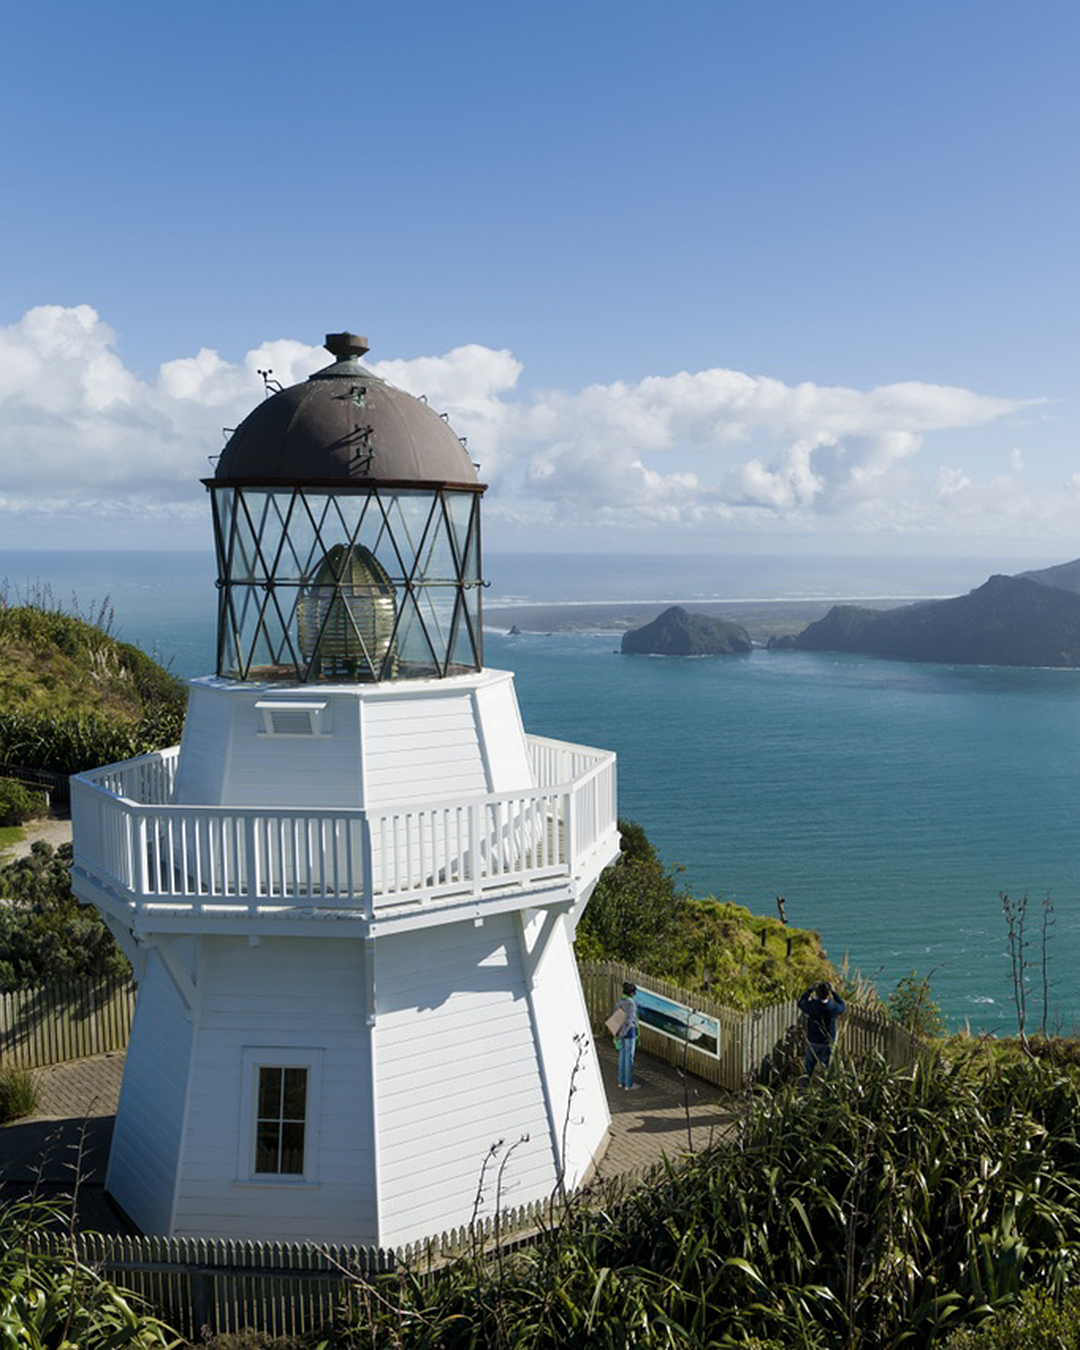 View of the lighthouse and Manukau Heads at Awhitu Peninsula